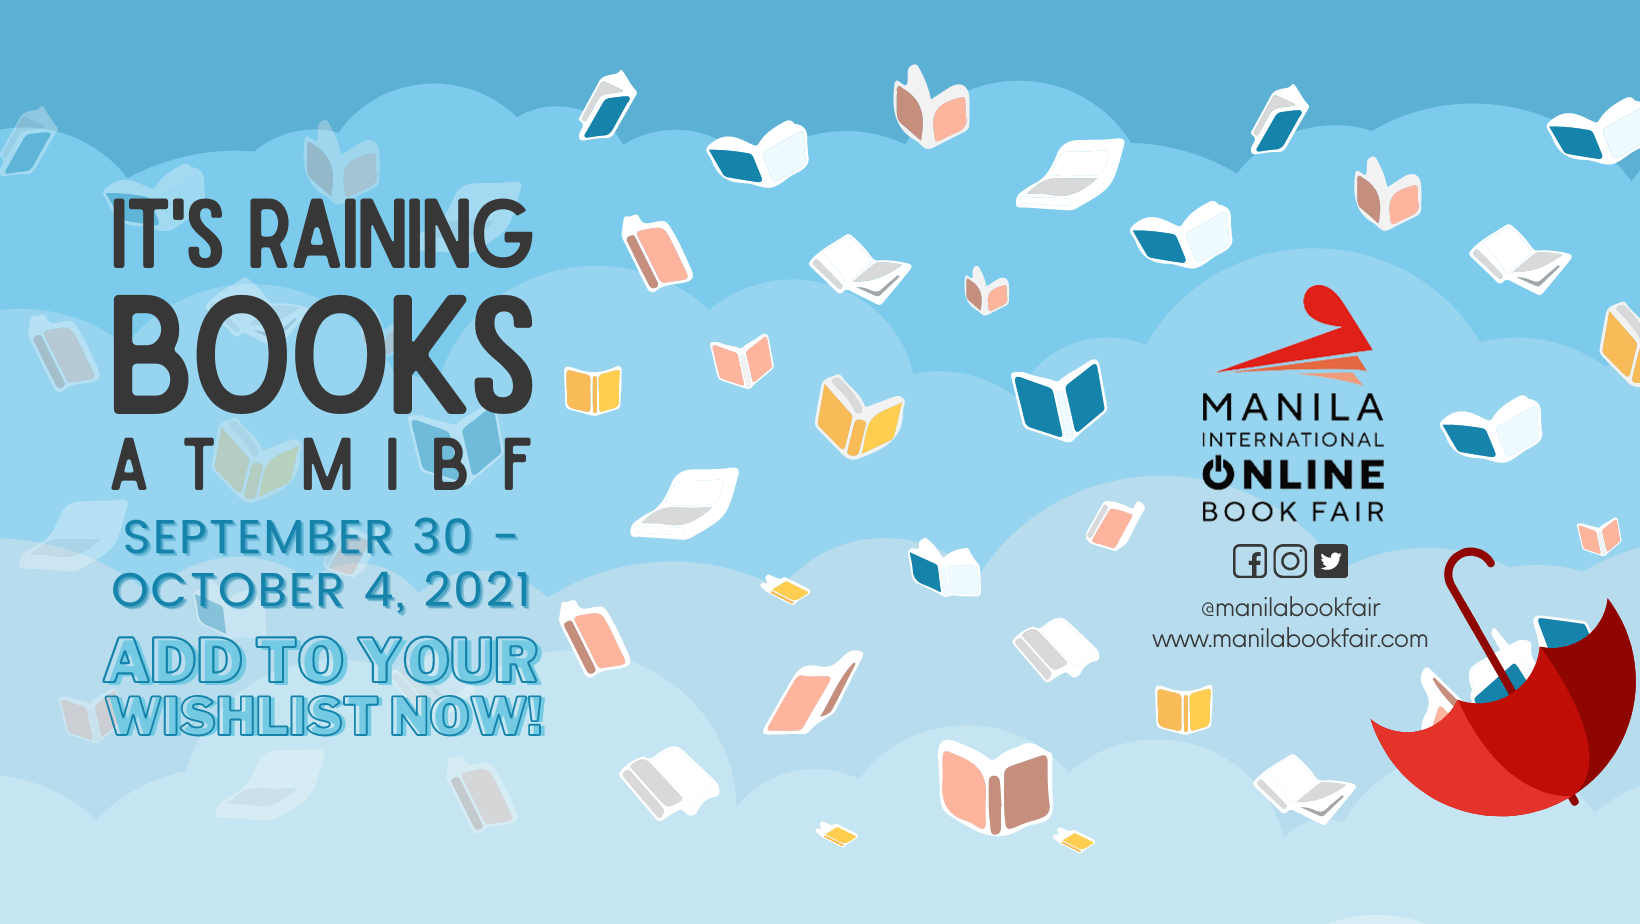 Photo Courtesy Of Manila International Book Fair